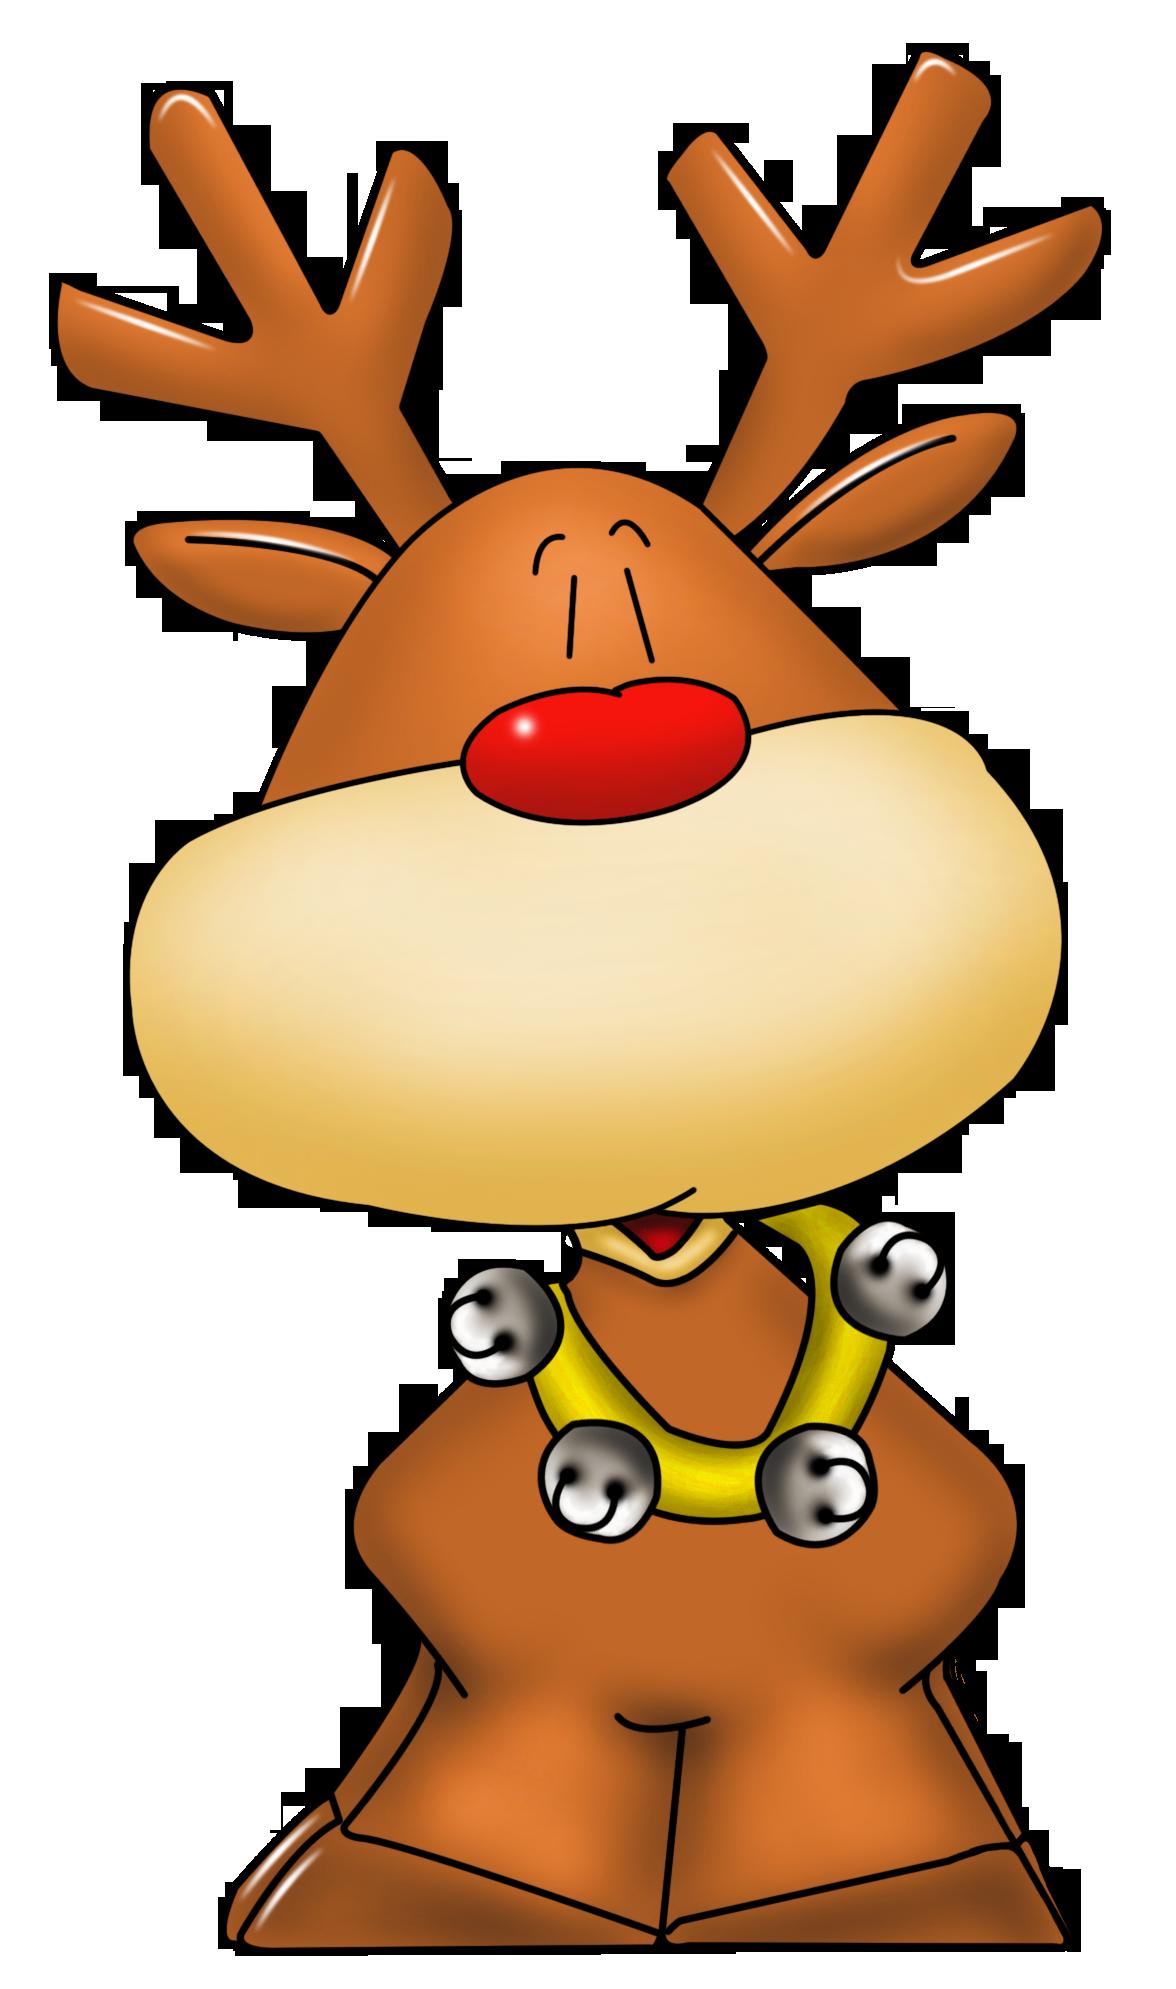 Rudolph Clip Art Cliparts Co-Rudolph Clip Art Cliparts Co-3